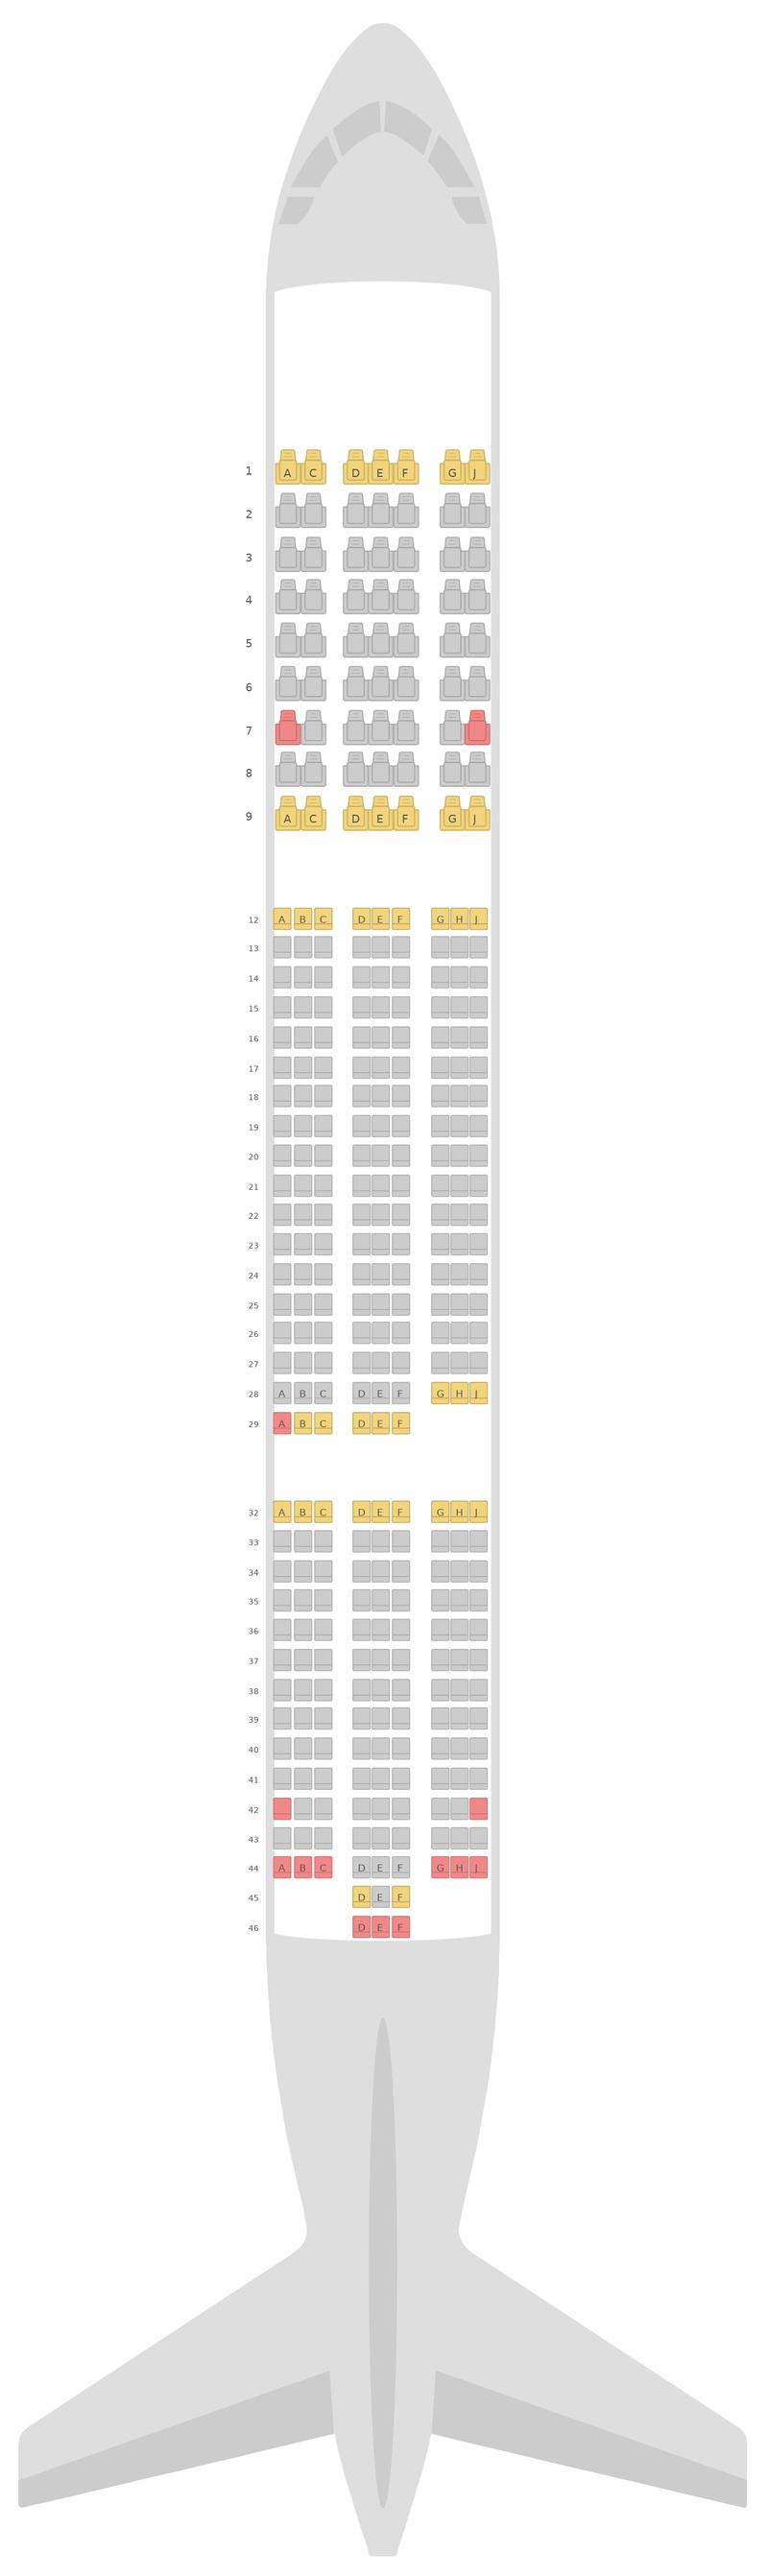 Sitzplan Boeing 787-9 (789) TUI Airways